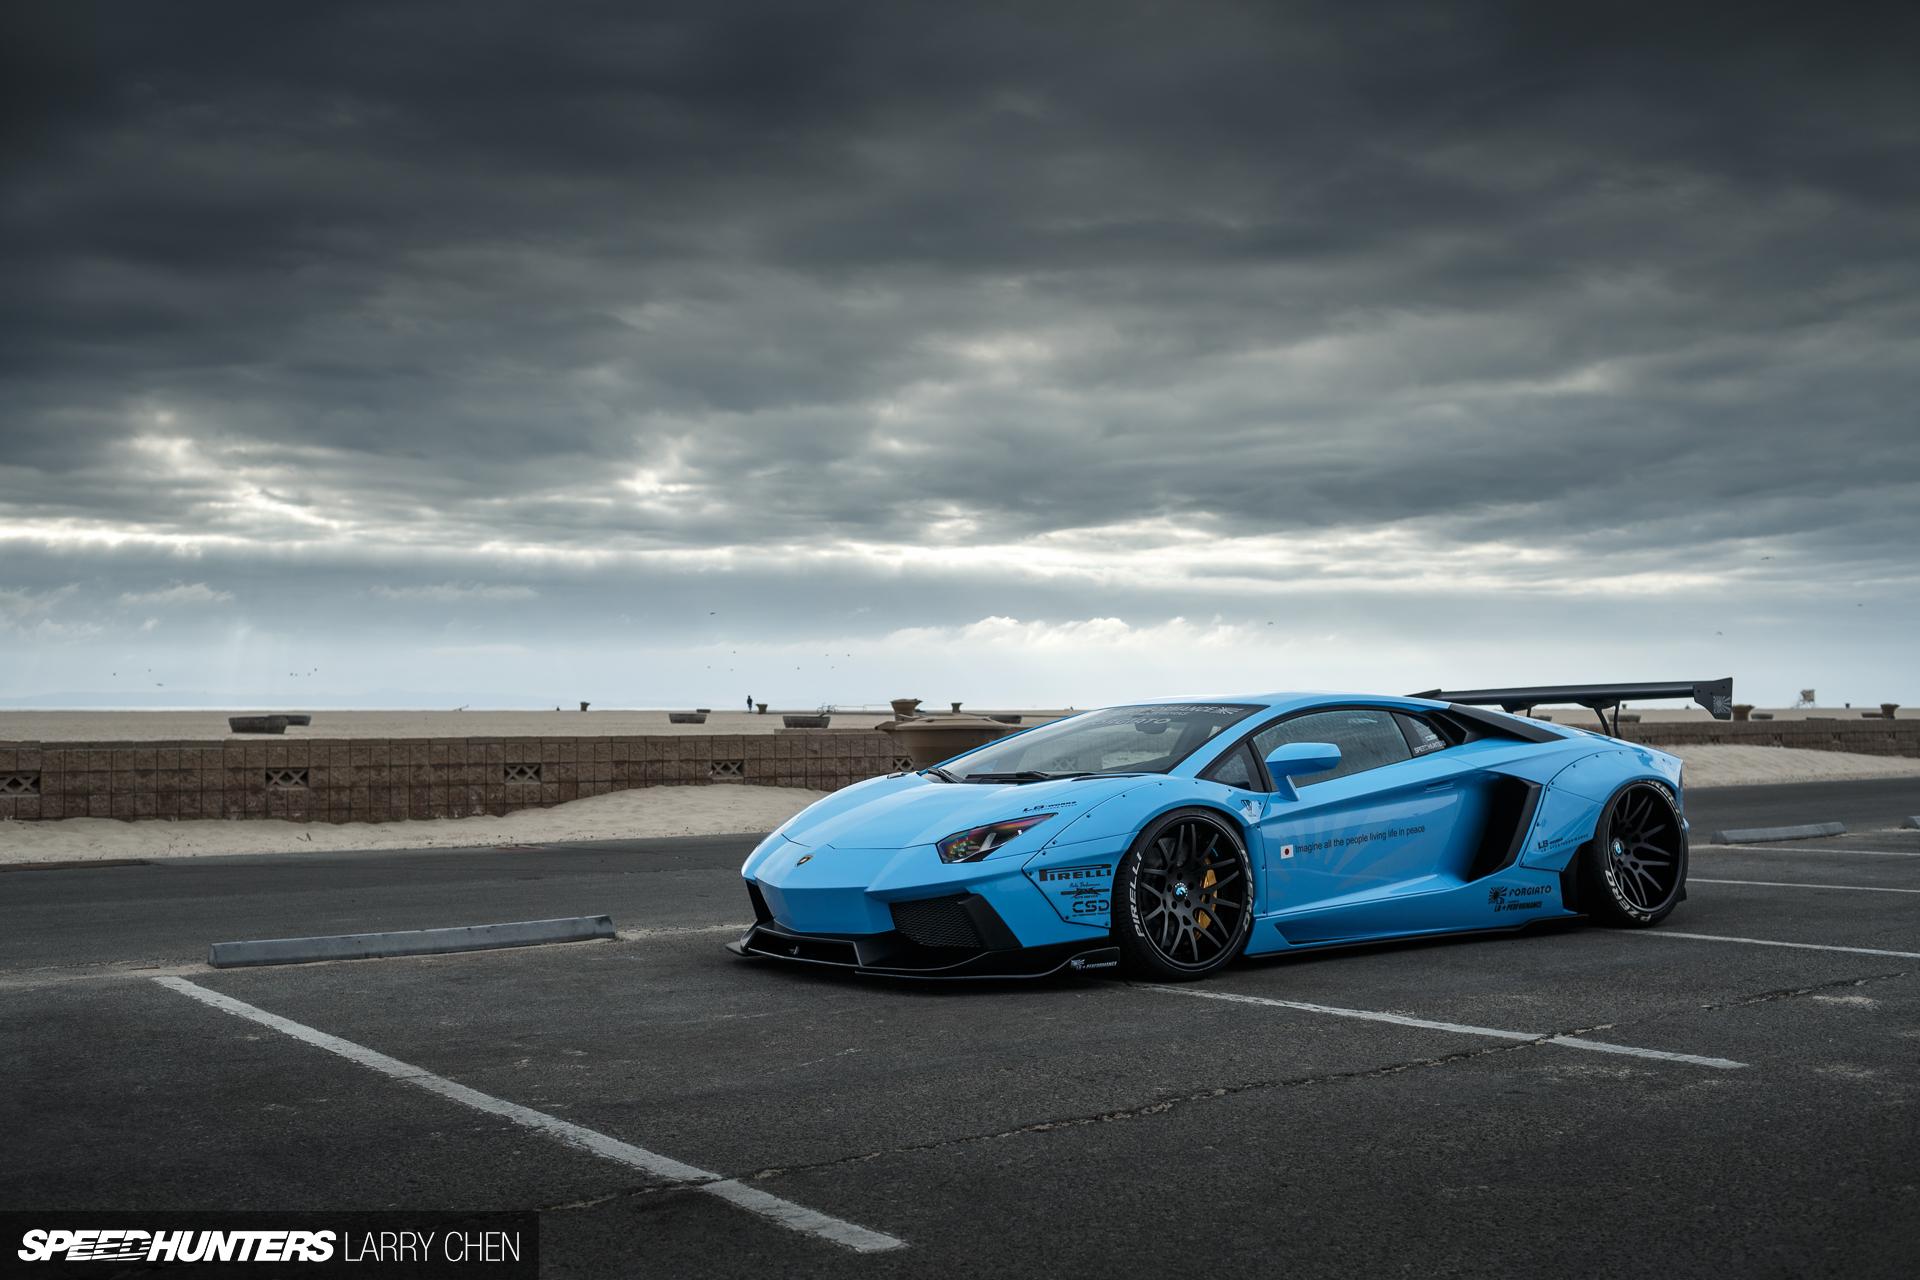 4k Wallpaper Muscle Car Blue Shark Attack Lb Works Aventador Speedhunters